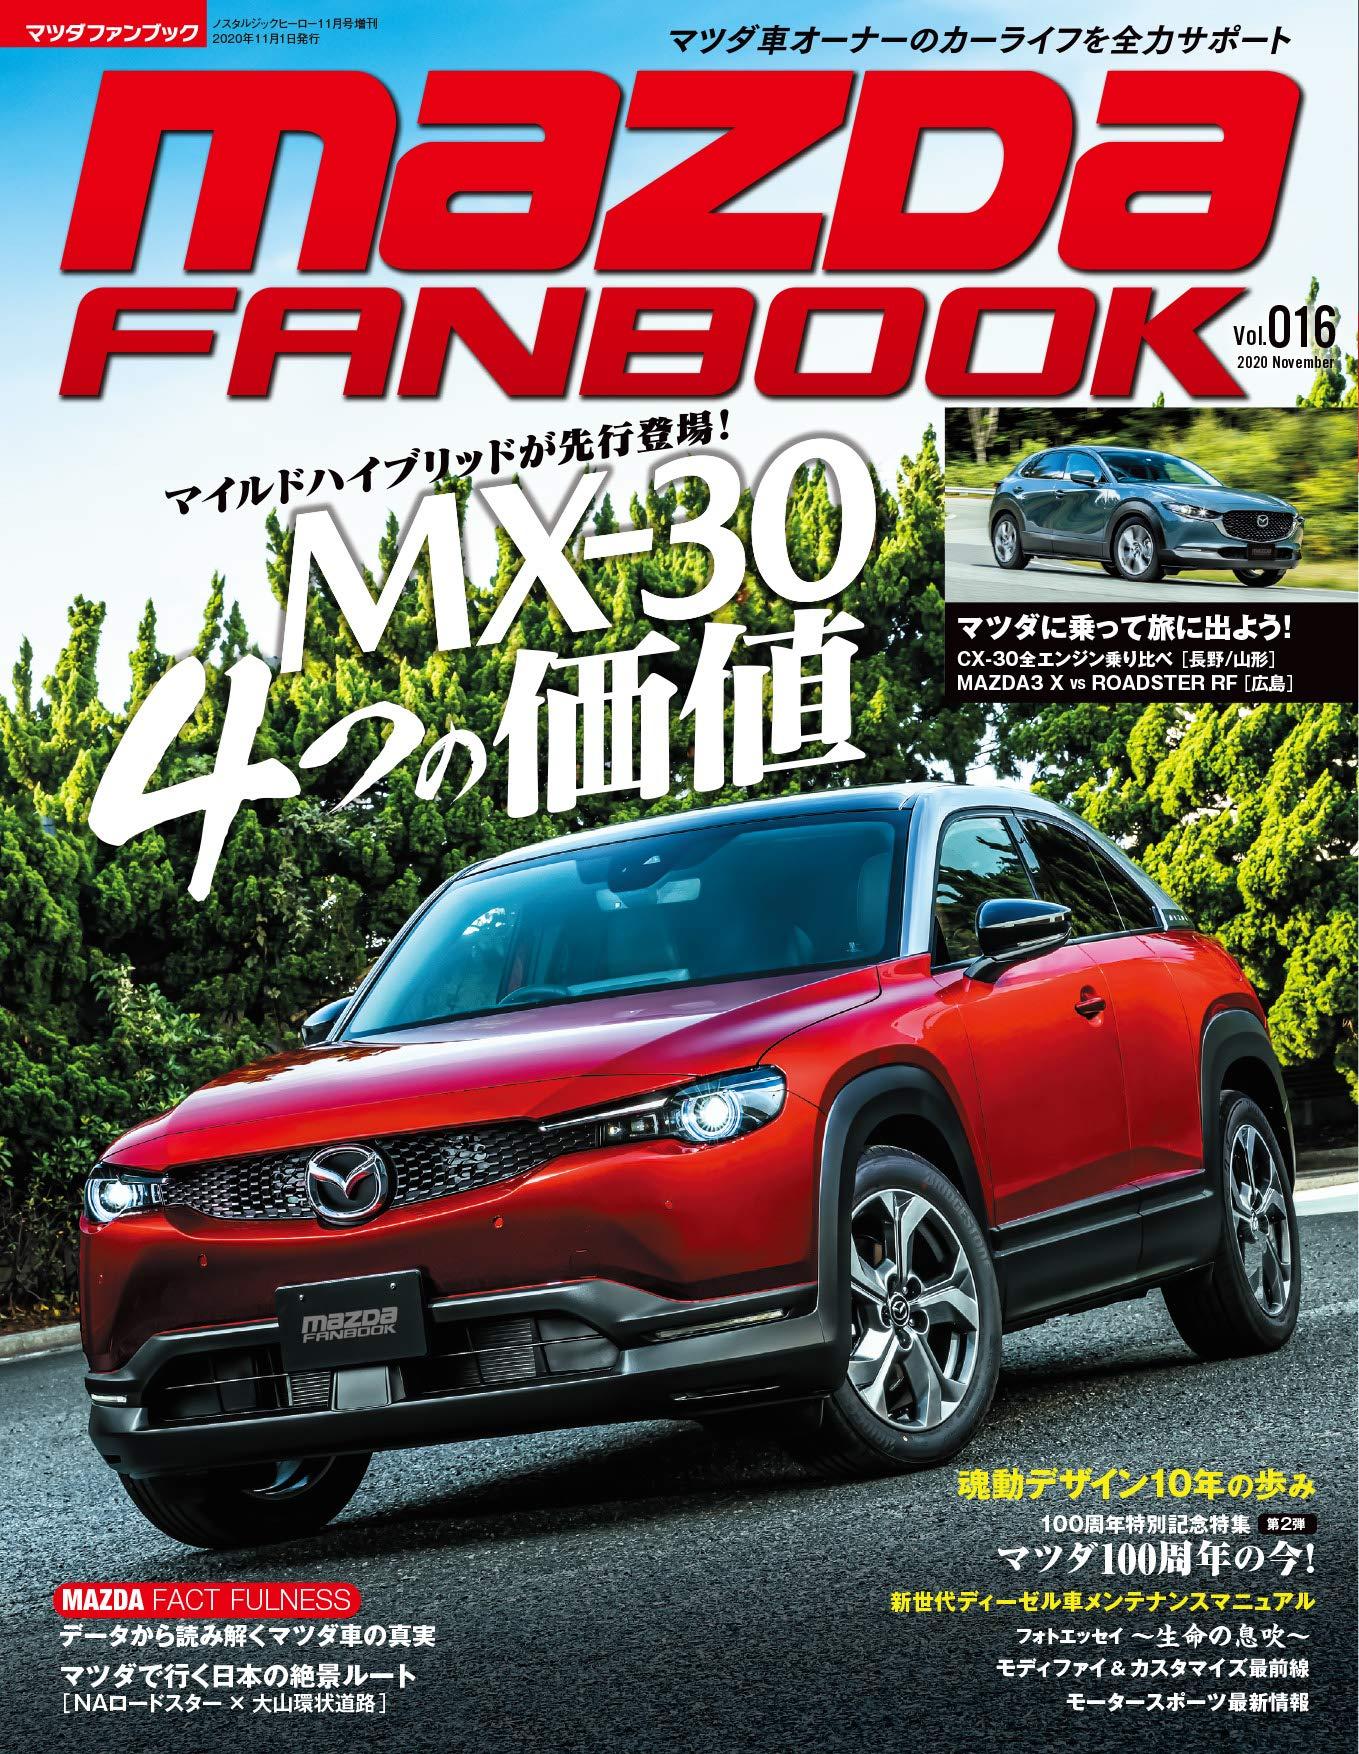 MAZDA FANBOOK (マツダファンブック) Vol.016